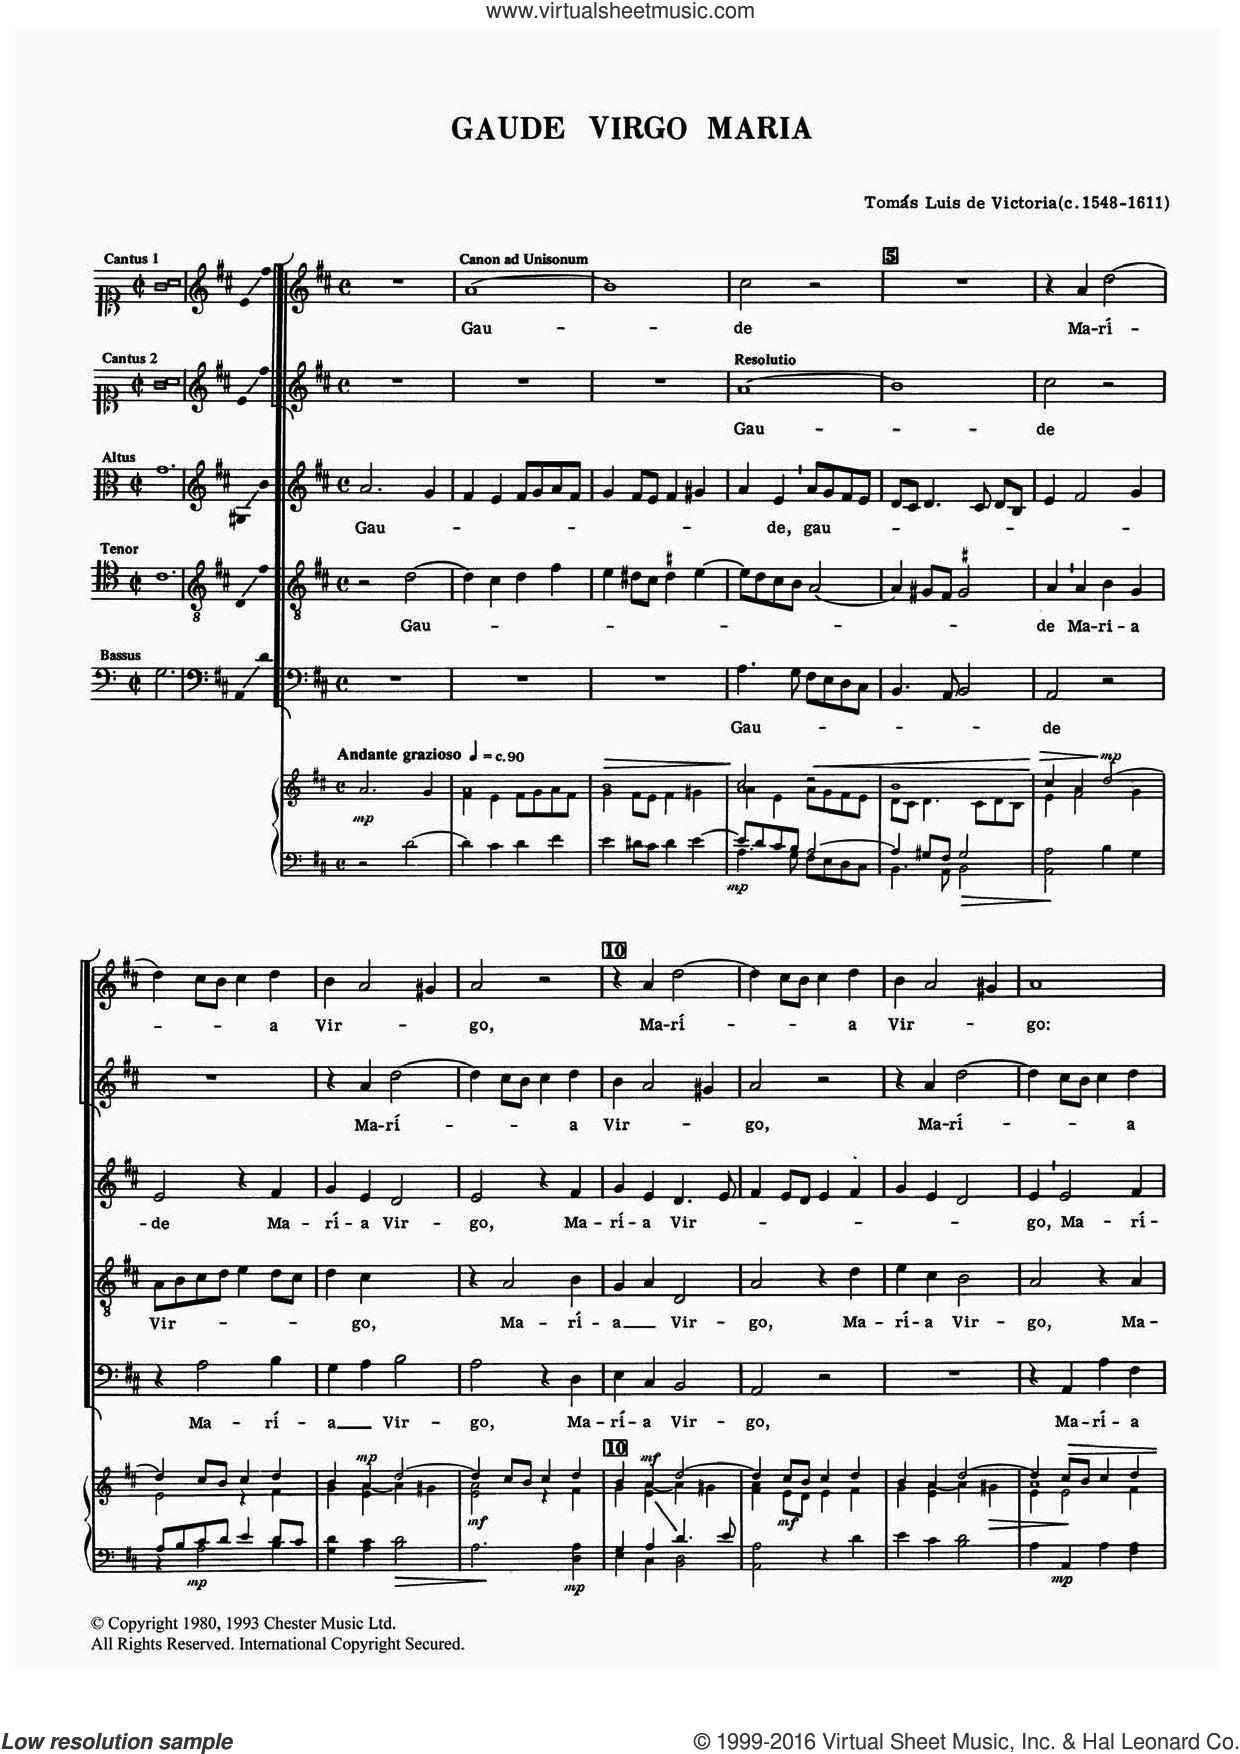 Gaude Virgo Maria sheet music for voice, piano or guitar by Tomàs Luis de Victoria and Tomas Luis De Victoria, classical score, intermediate skill level